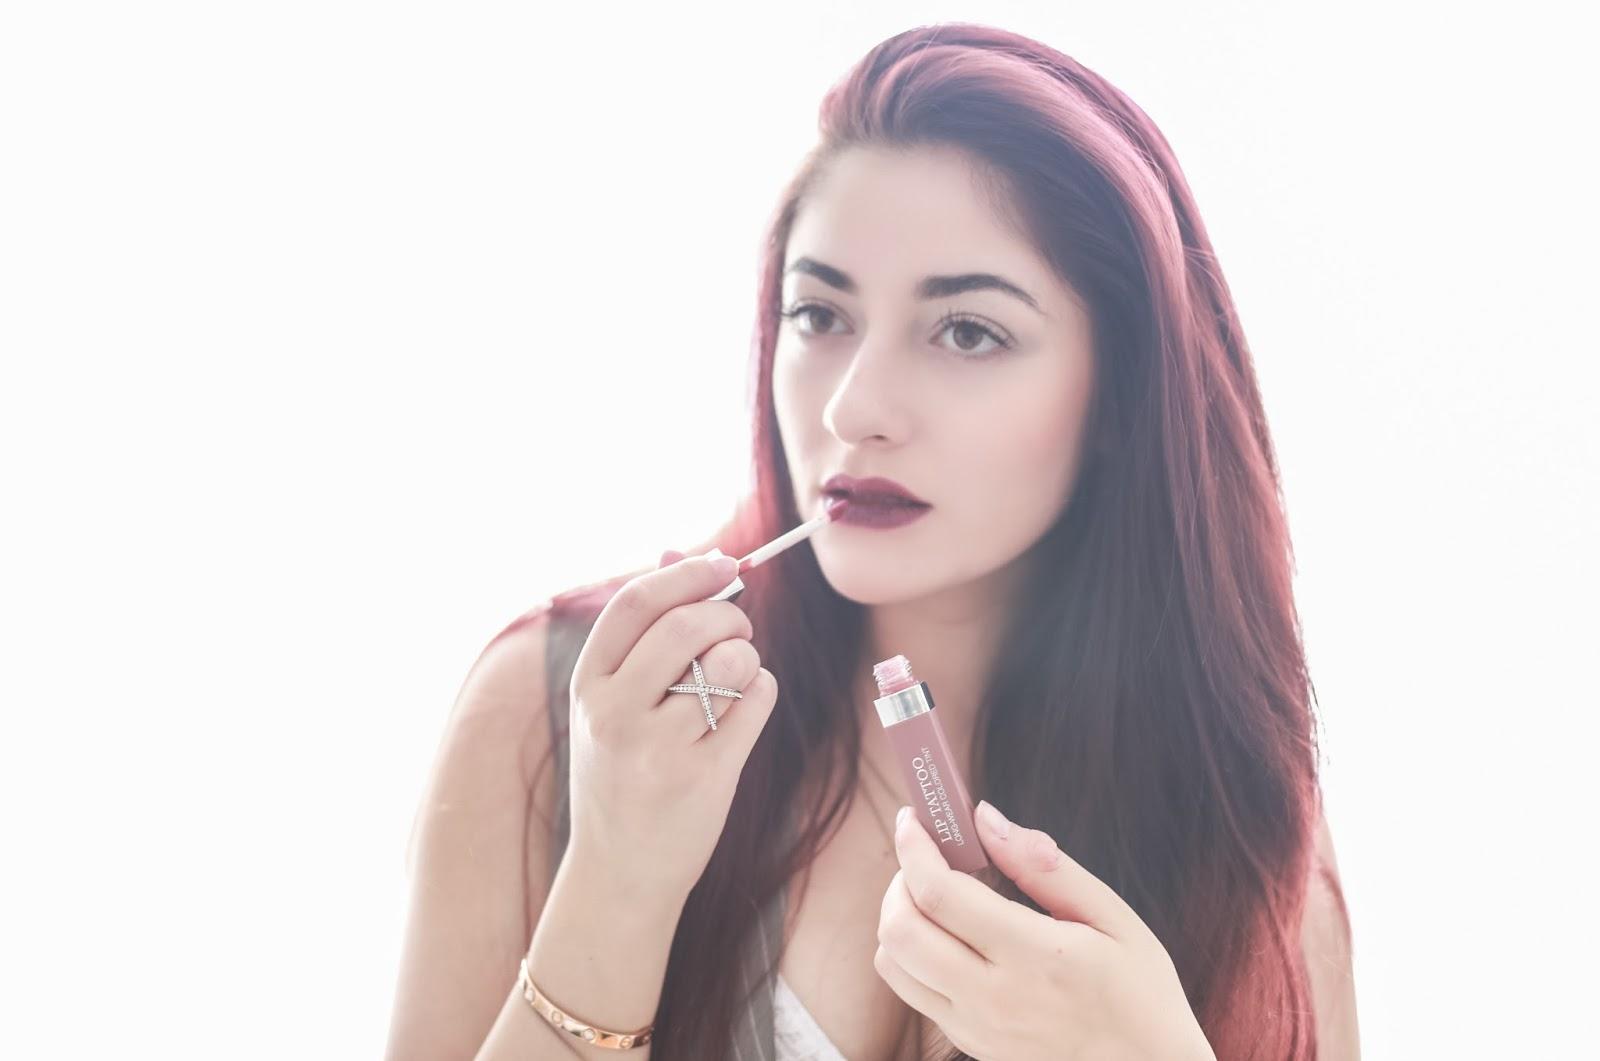 dior addict lip tattoo venus is naive